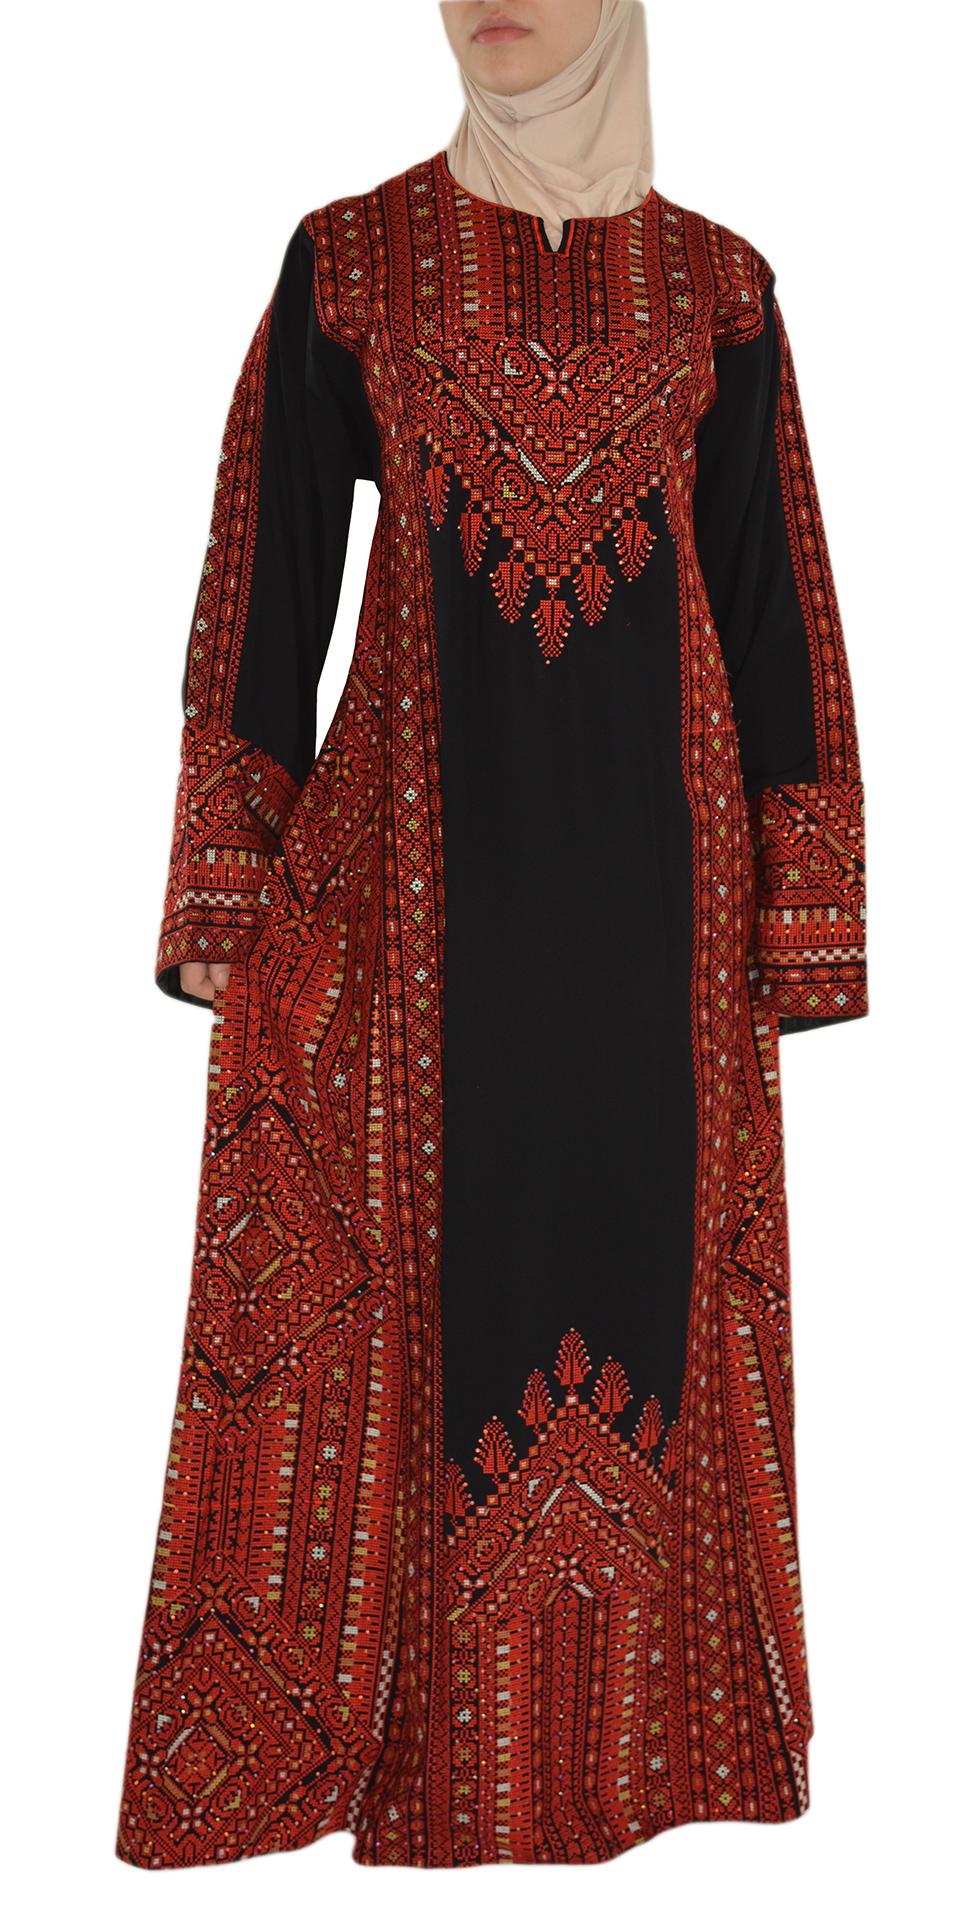 Red Fellah Dress Front Shot Spread